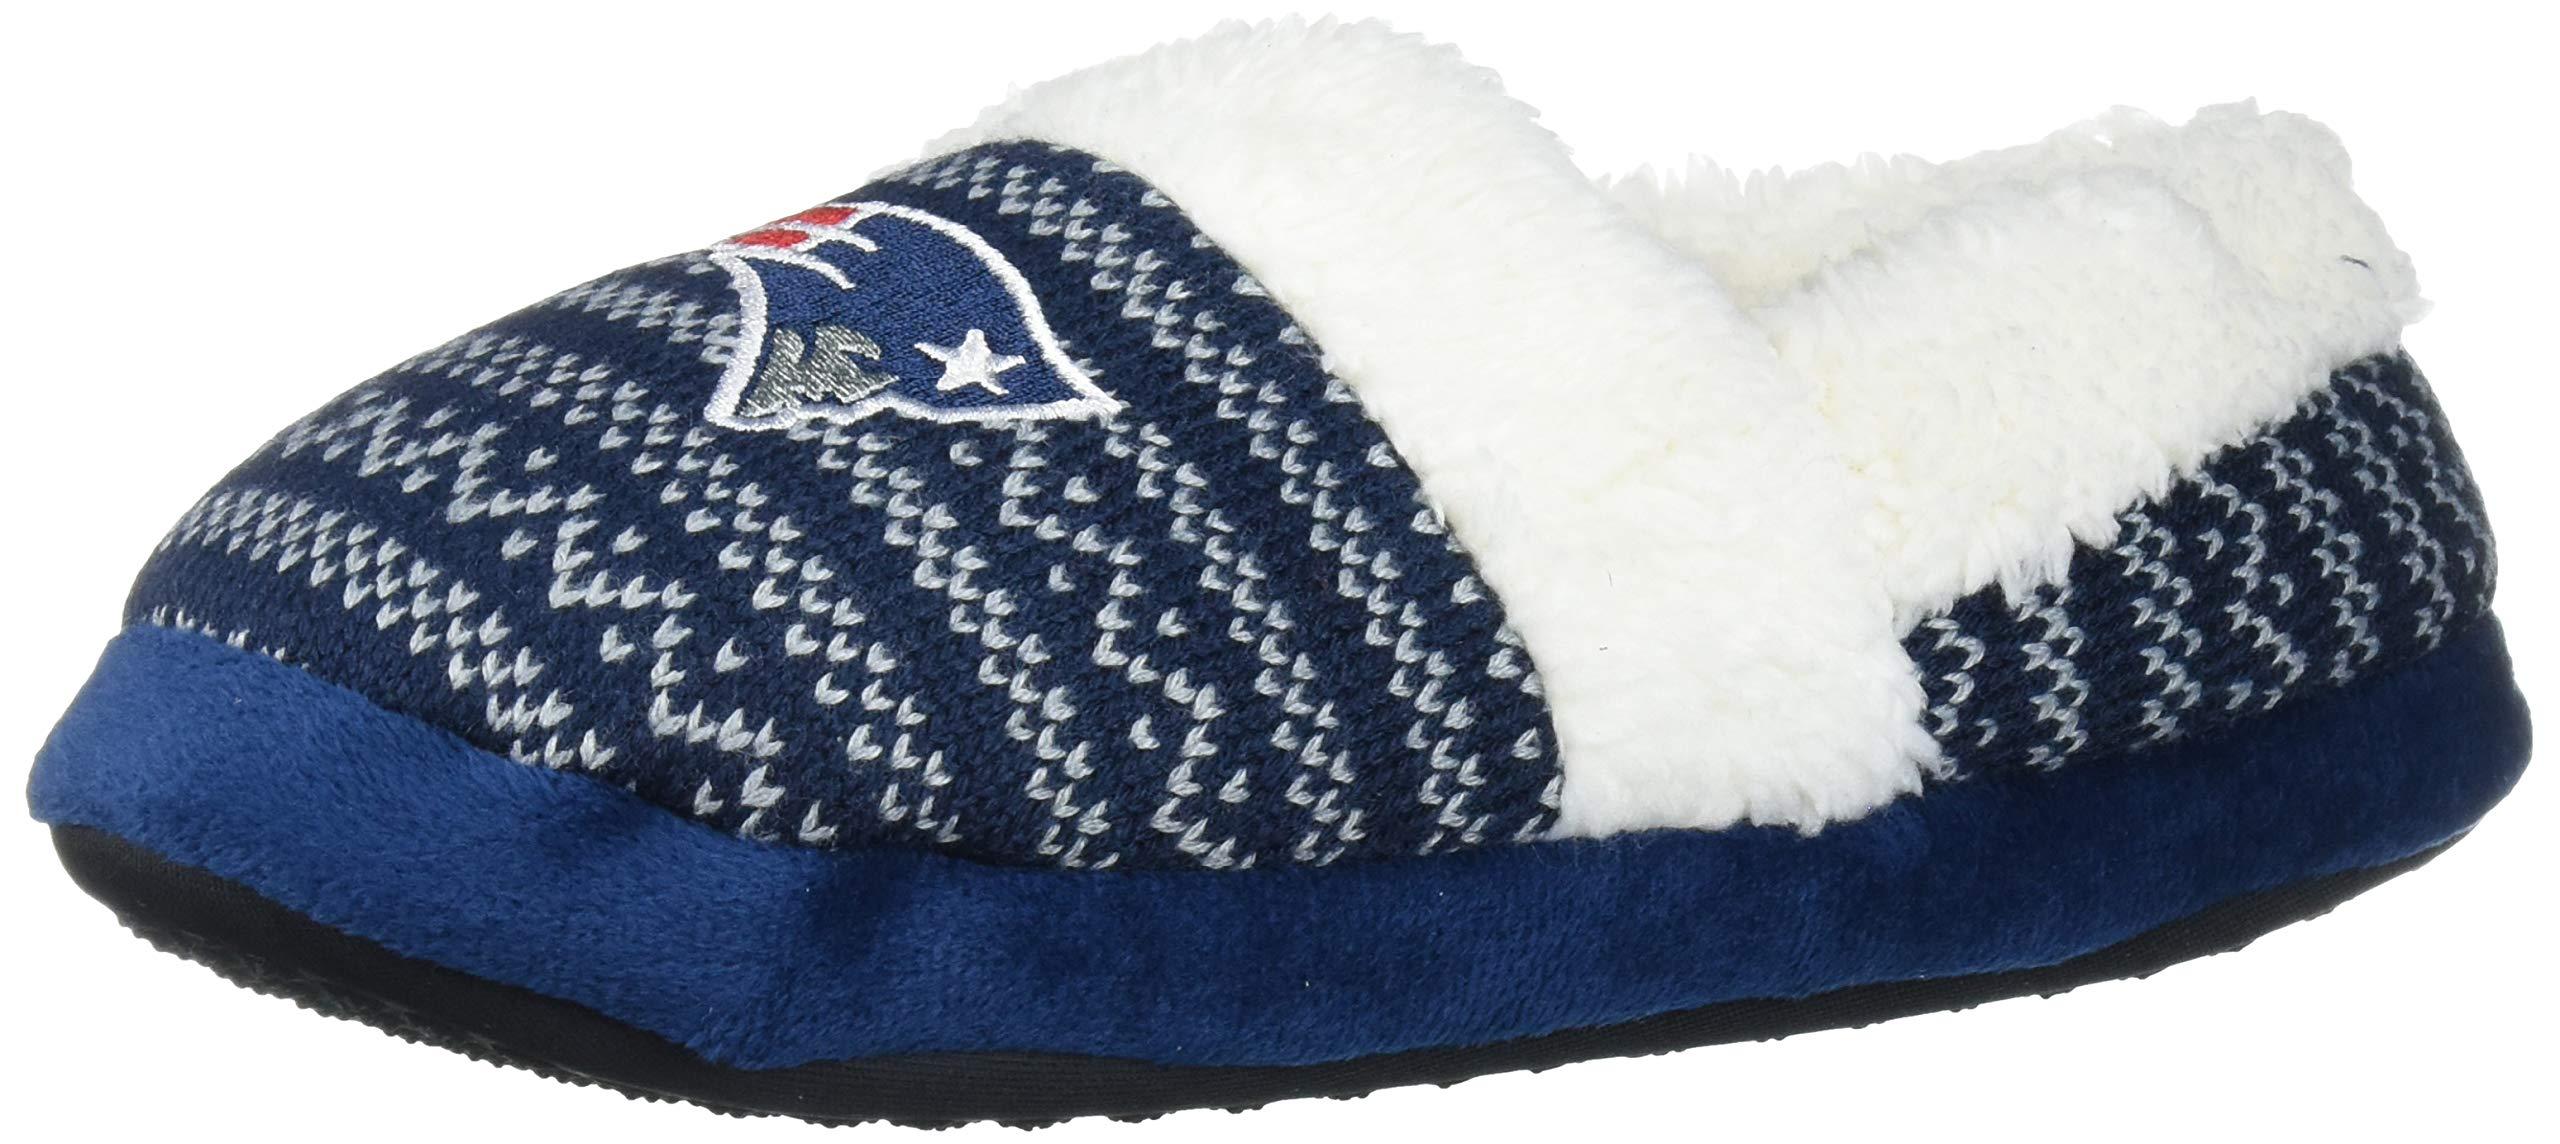 FOCO NFL Unisex SMU Big Logo Holiday Aztec Print Knit Moccasin